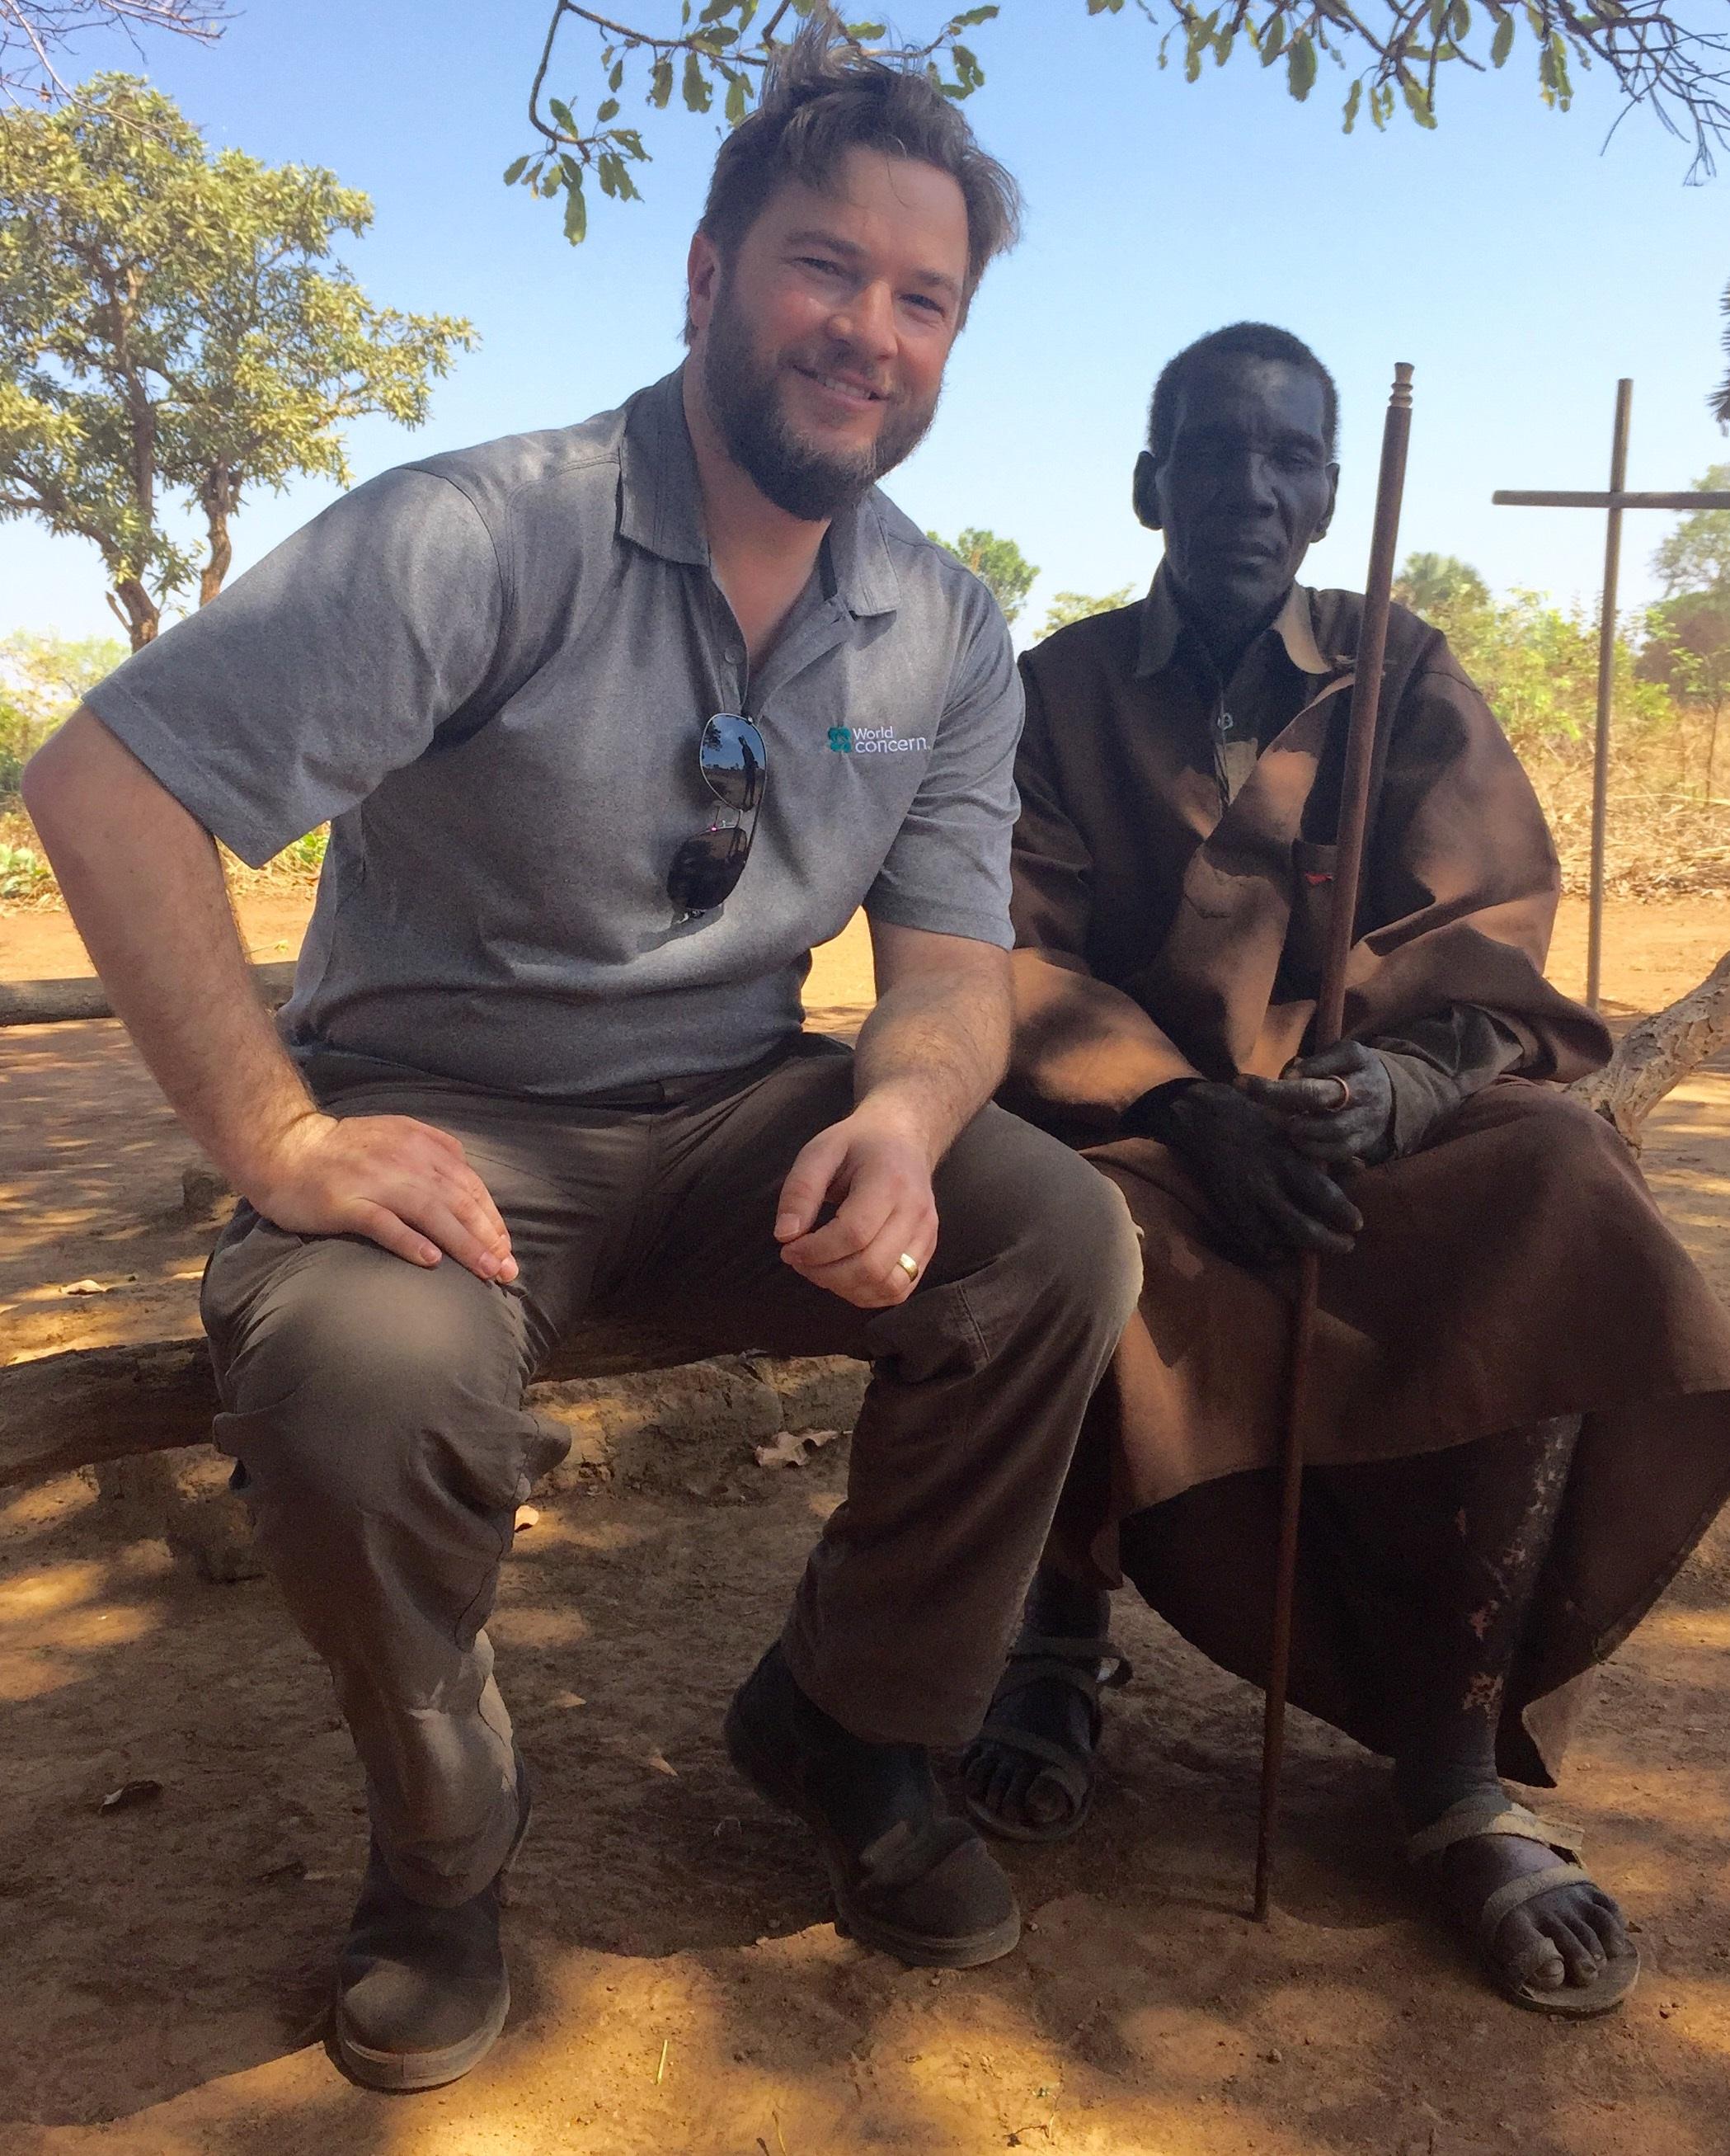 South Sudan disintegrates